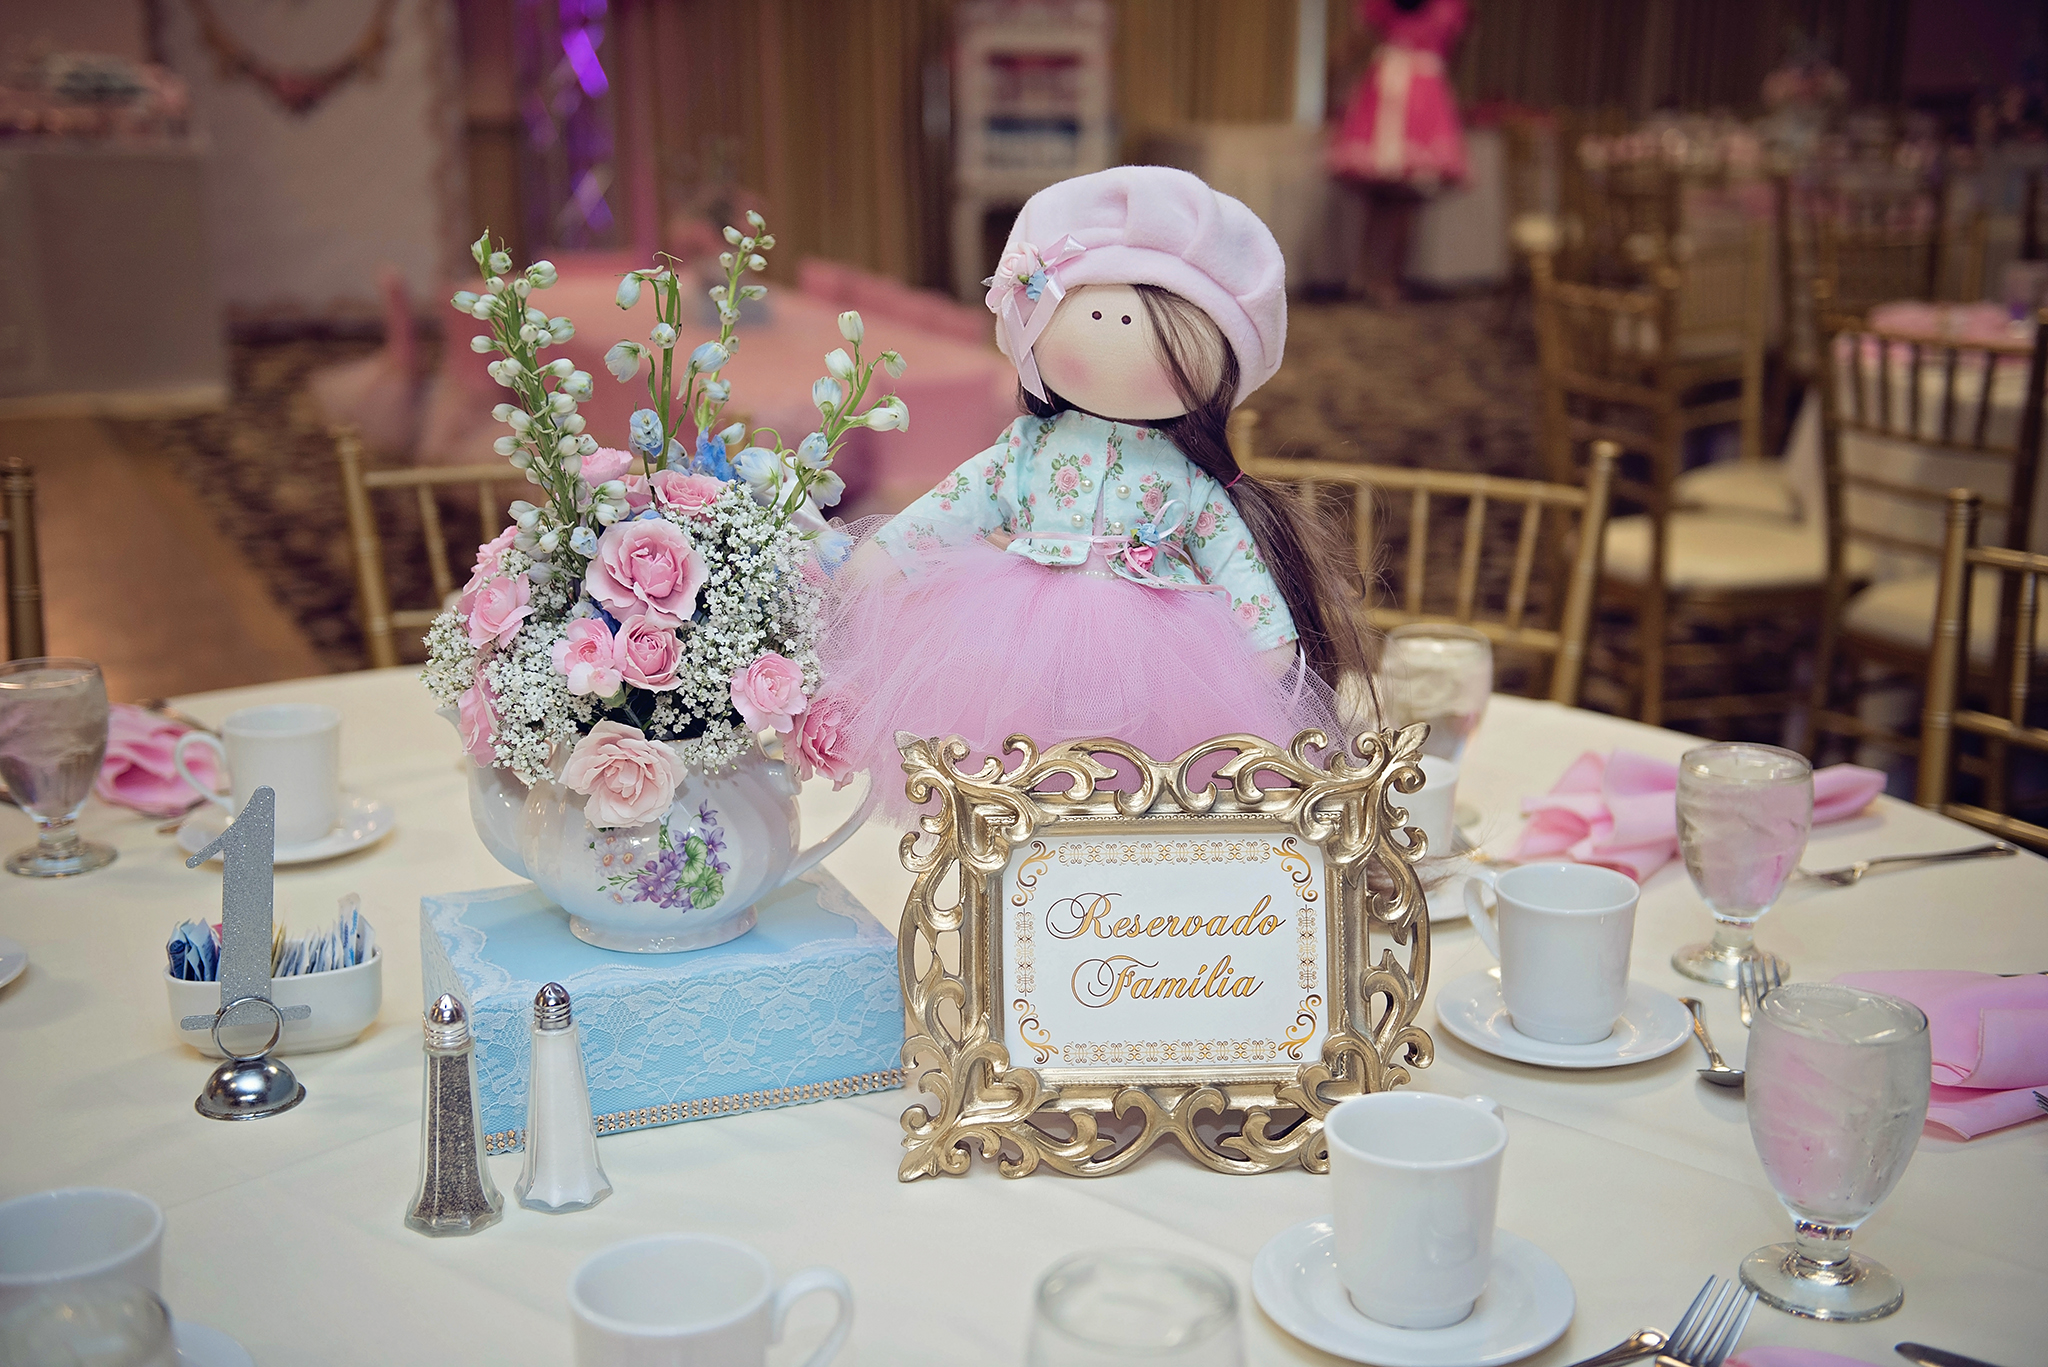 NJ-NY-cakesmash-birthday-Photographer-107.JPG